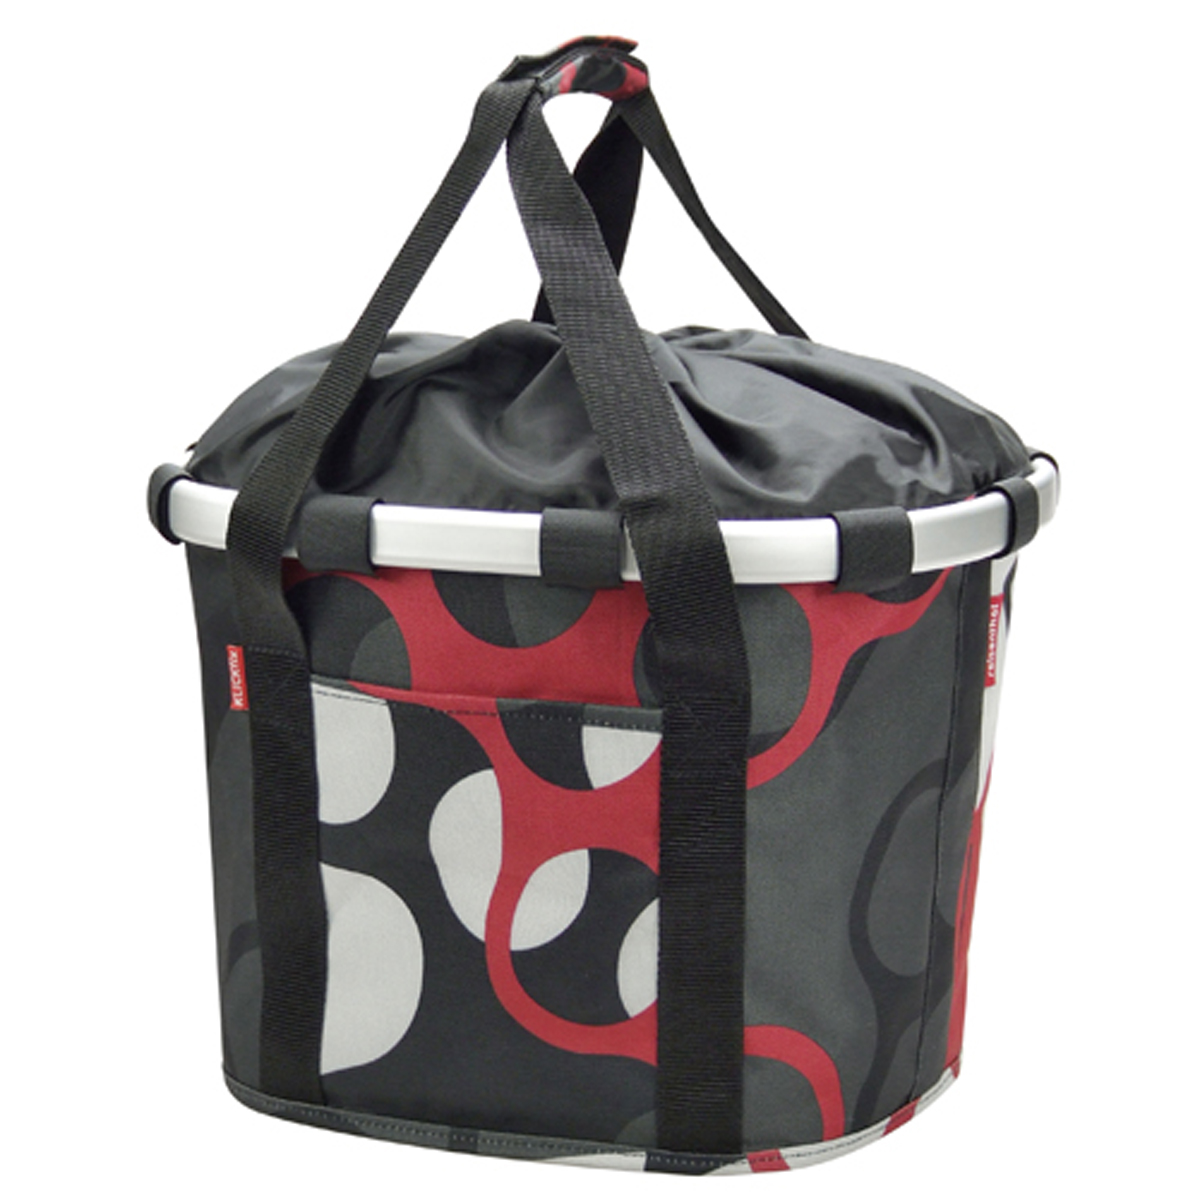 klickfix fahrrad lenkertasche reisenthel bikebasket rings mit adapter ebay. Black Bedroom Furniture Sets. Home Design Ideas